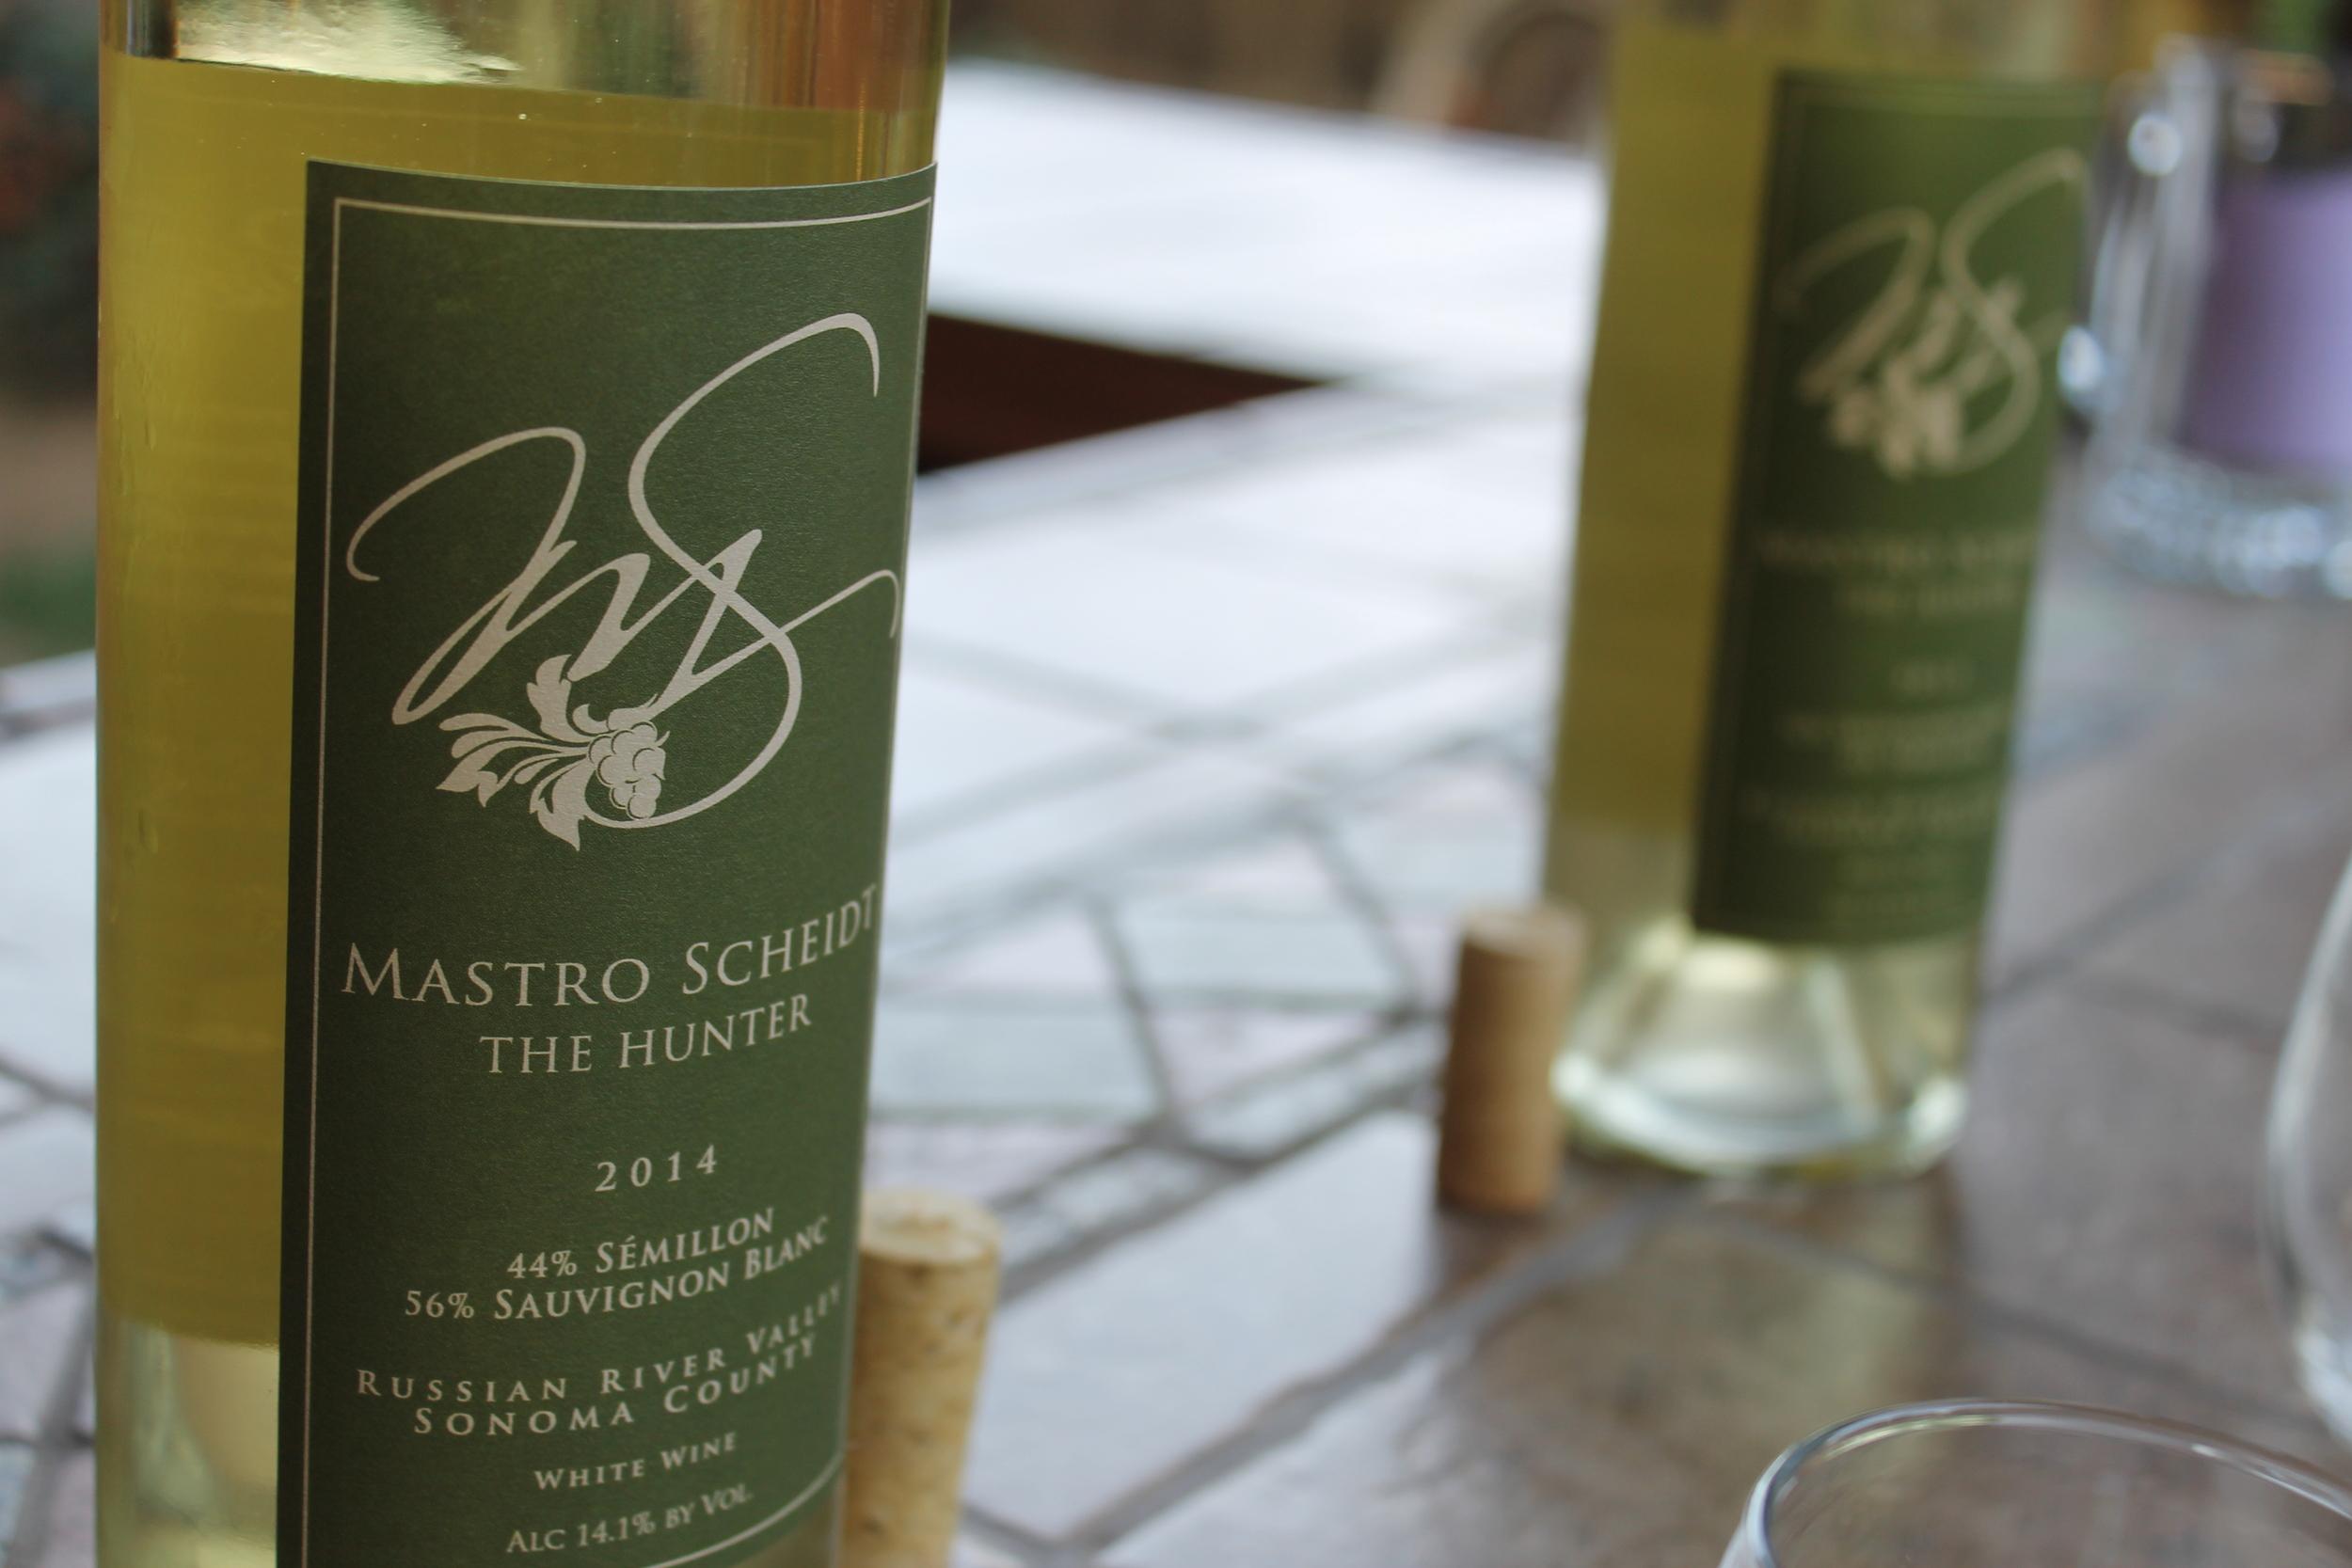 Mastro_scheidt_proprietary_white_wine